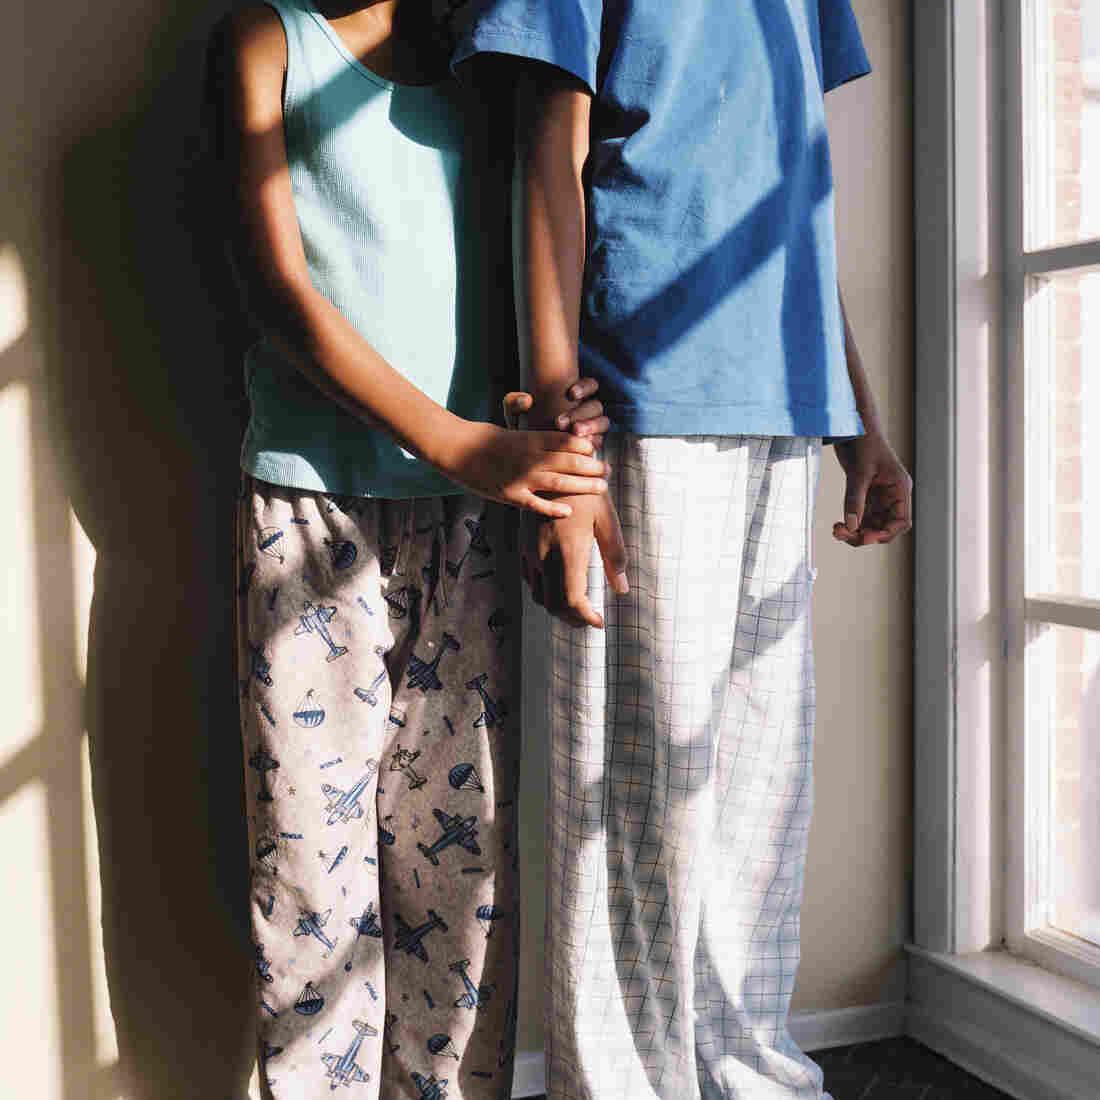 Thandi and Khaya holding each other while wearing pajamas.